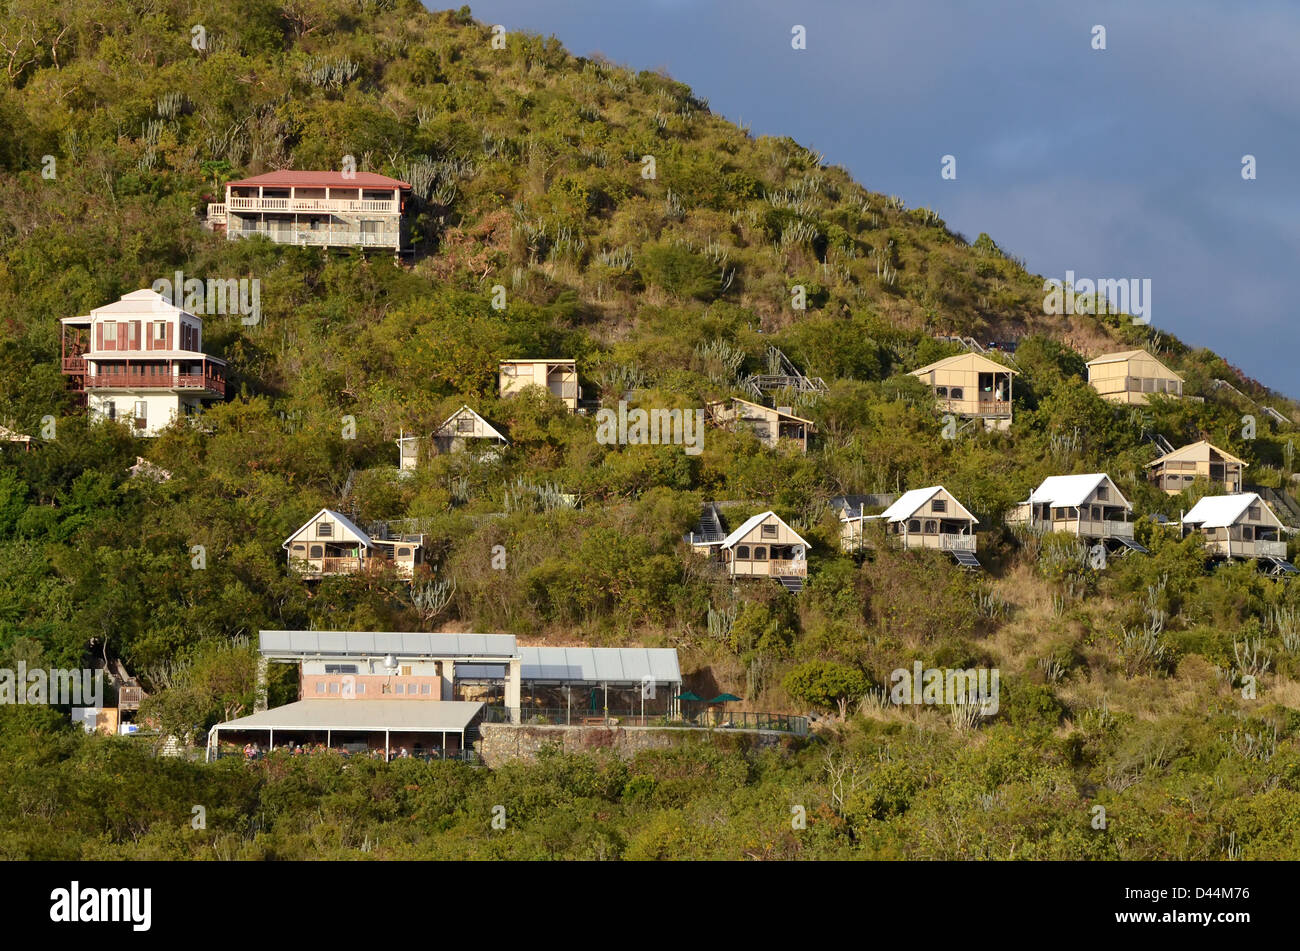 Concordia Eco Resort St. John U.S. Virgin Islands & Concordia Eco Resort St. John U.S. Virgin Islands Stock Photo ...